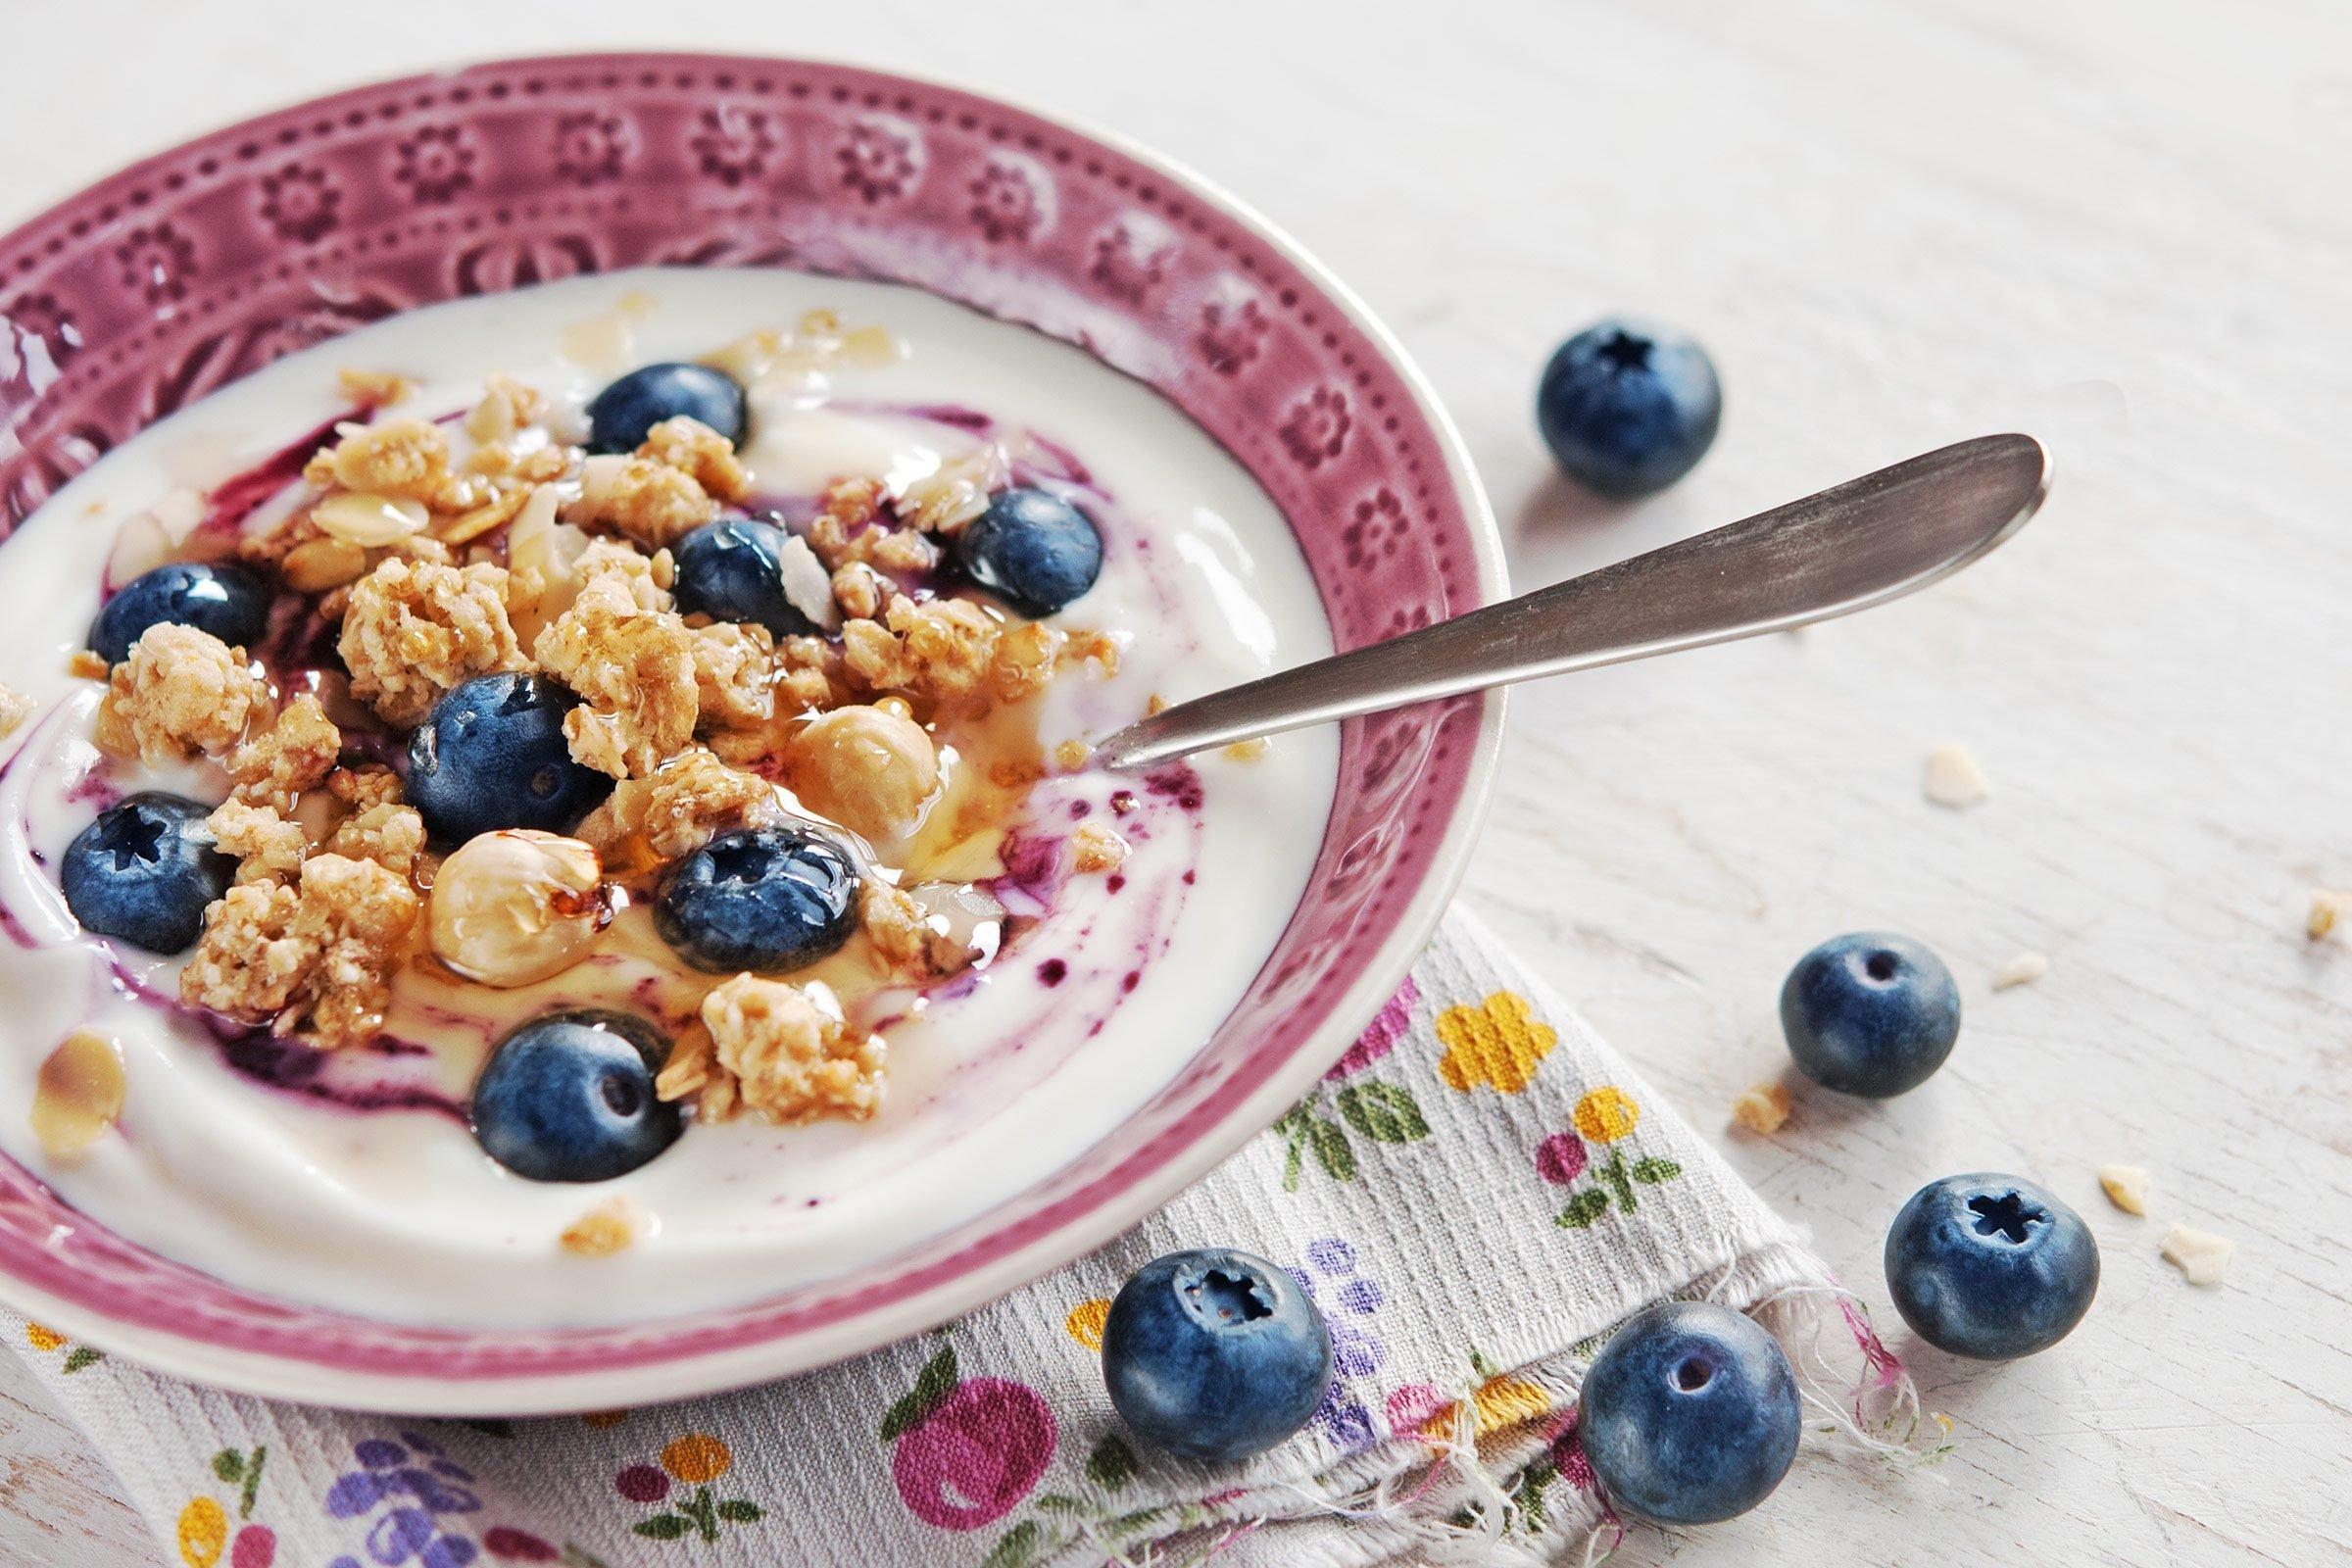 Pair fruit with breakfast foods.